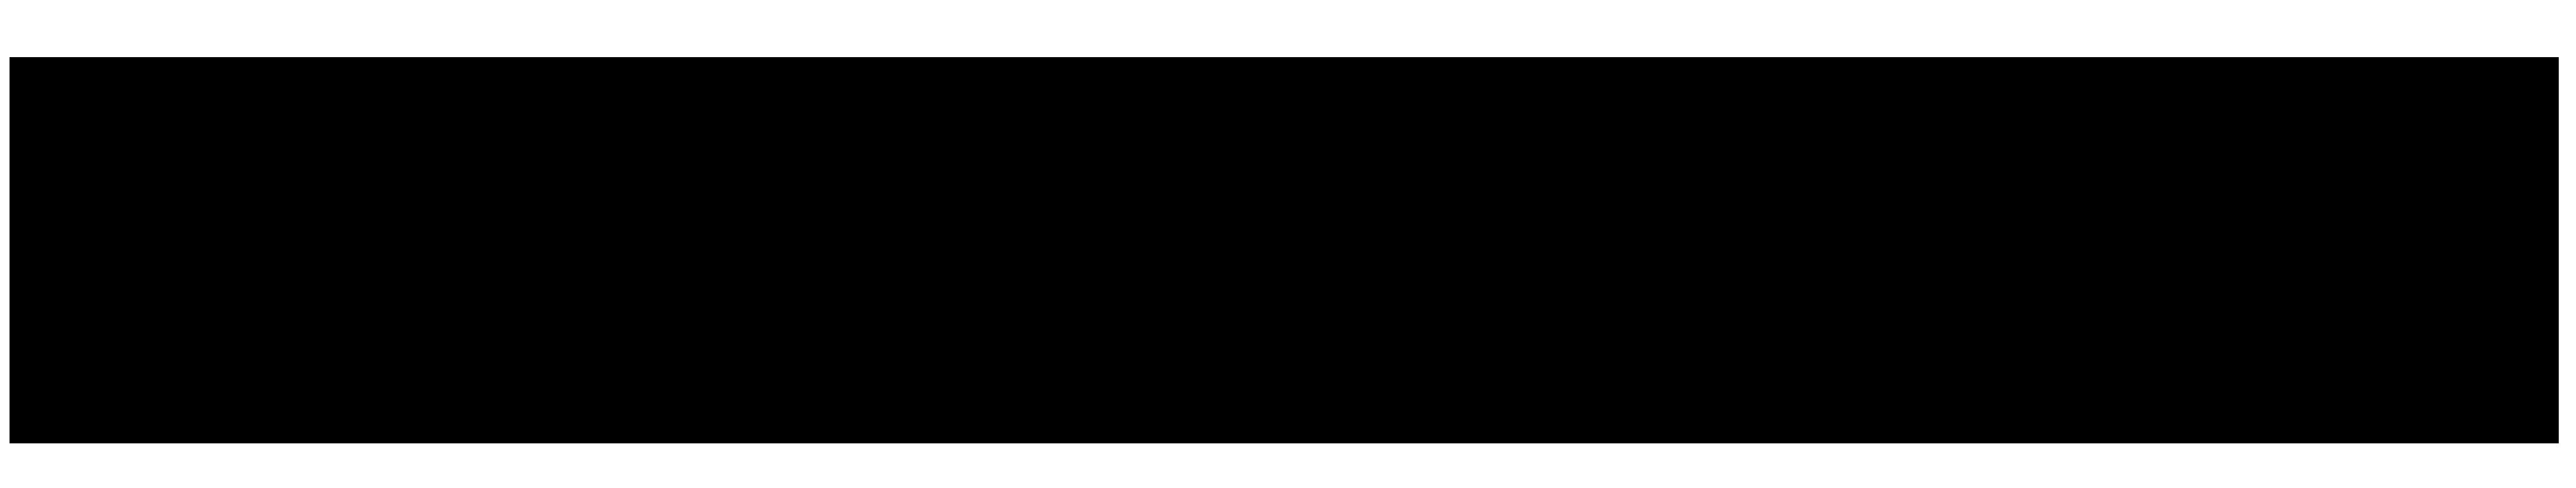 File:Equinox Fitness logo.png - Wikipedia